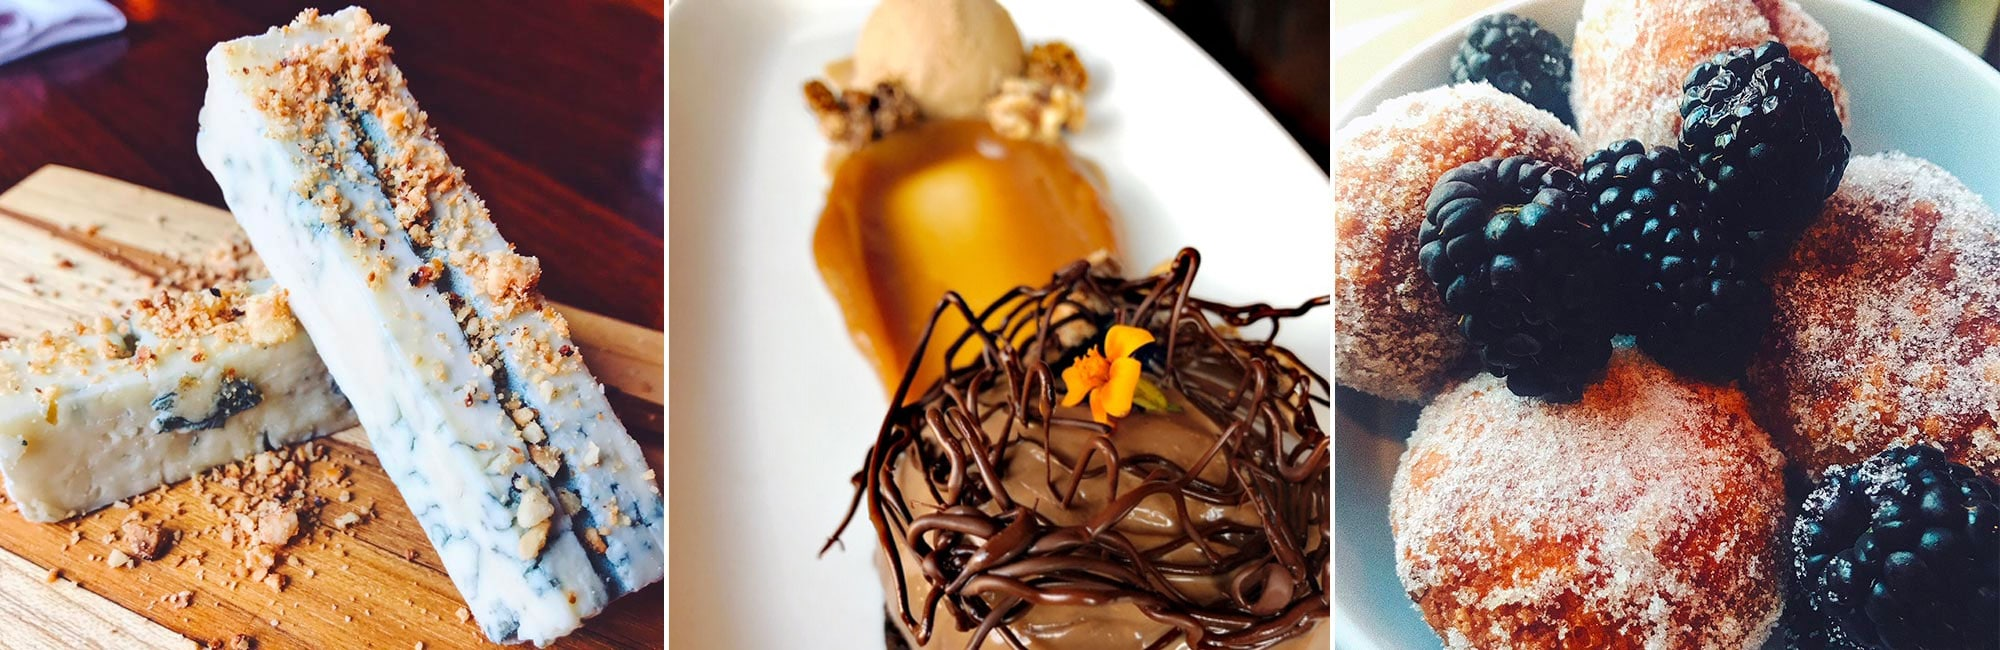 desserts-slide